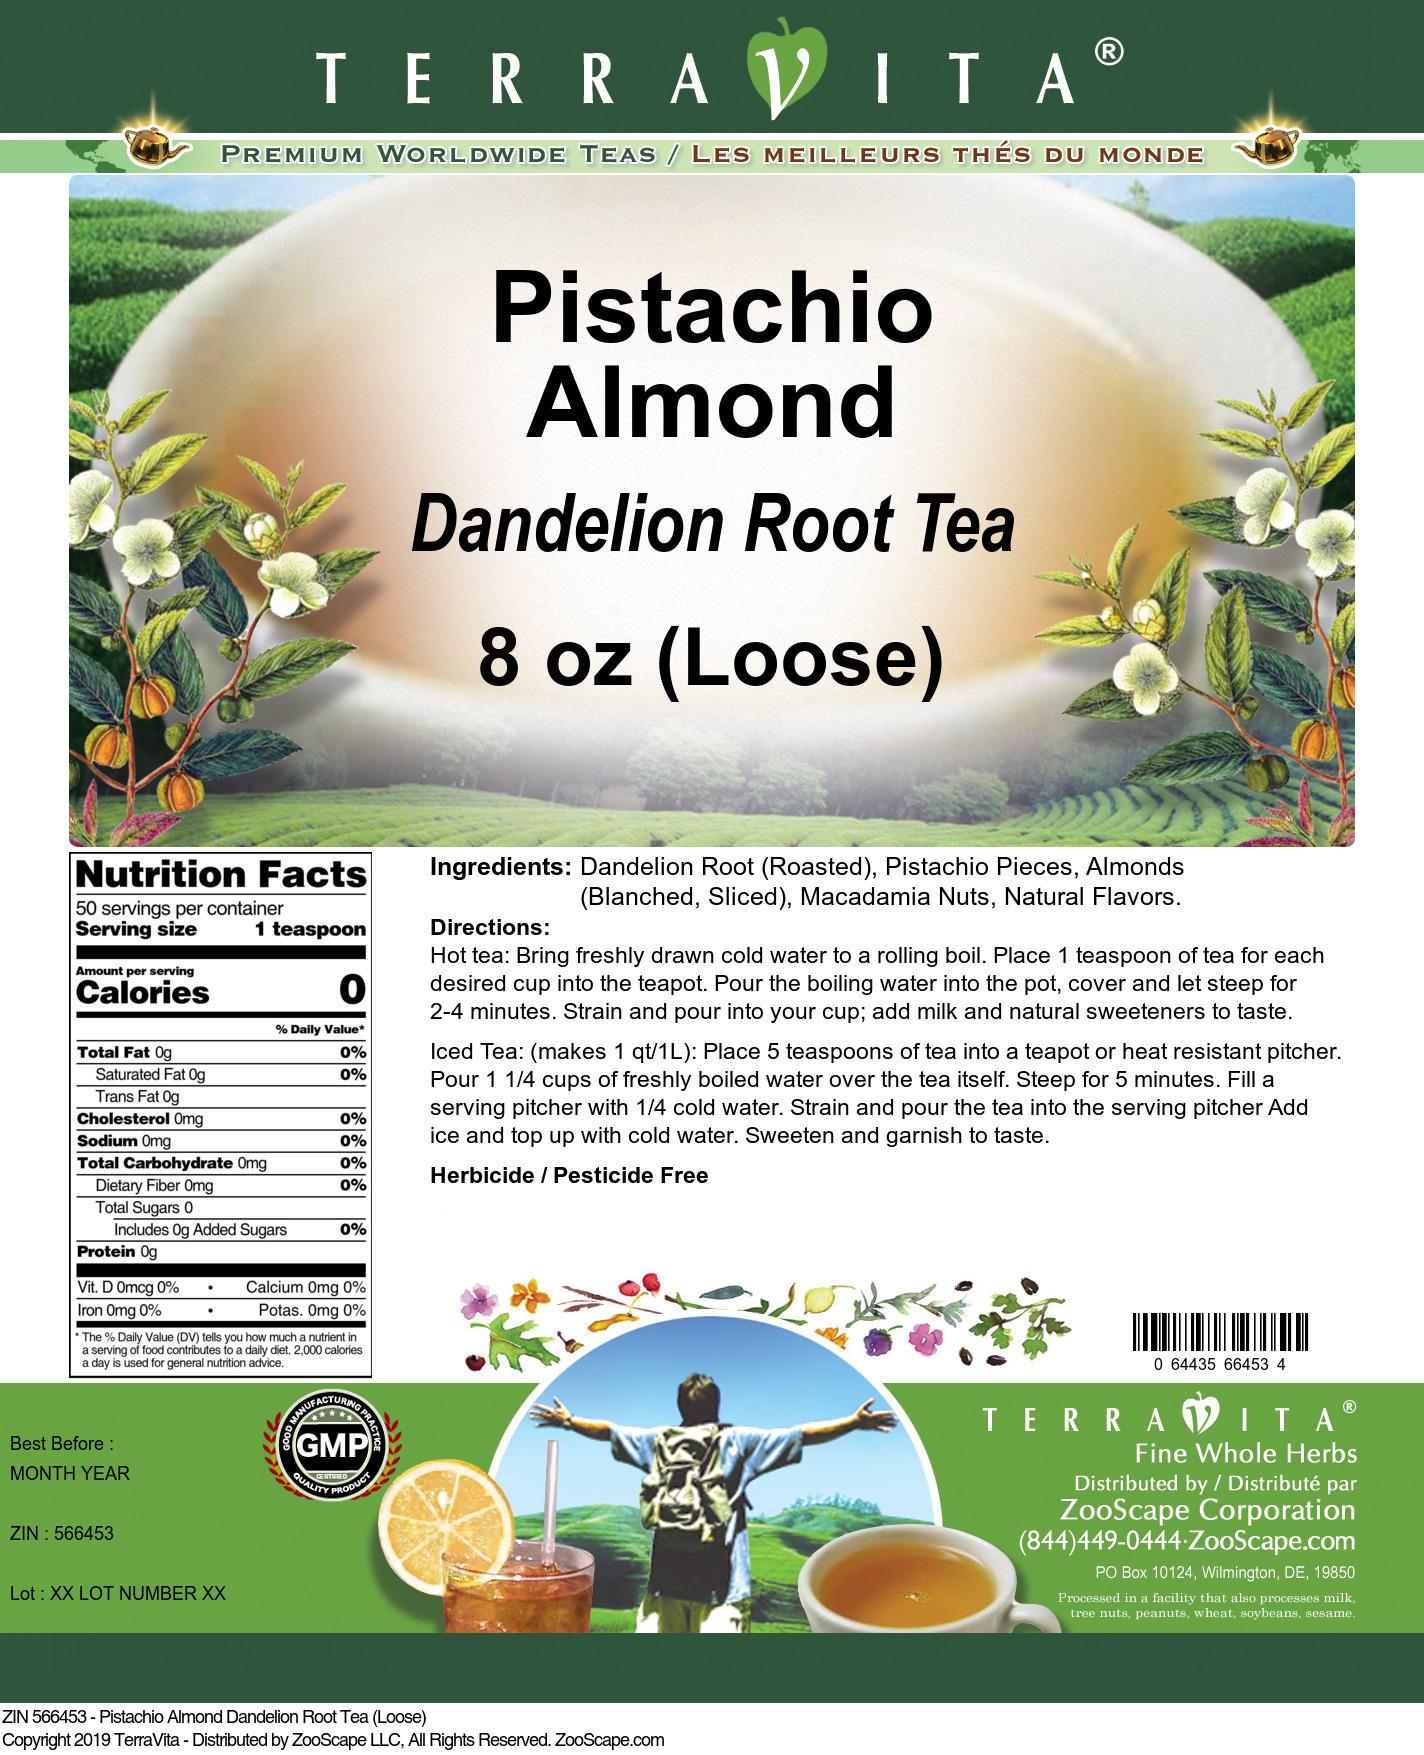 Pistachio Almond Dandelion Root